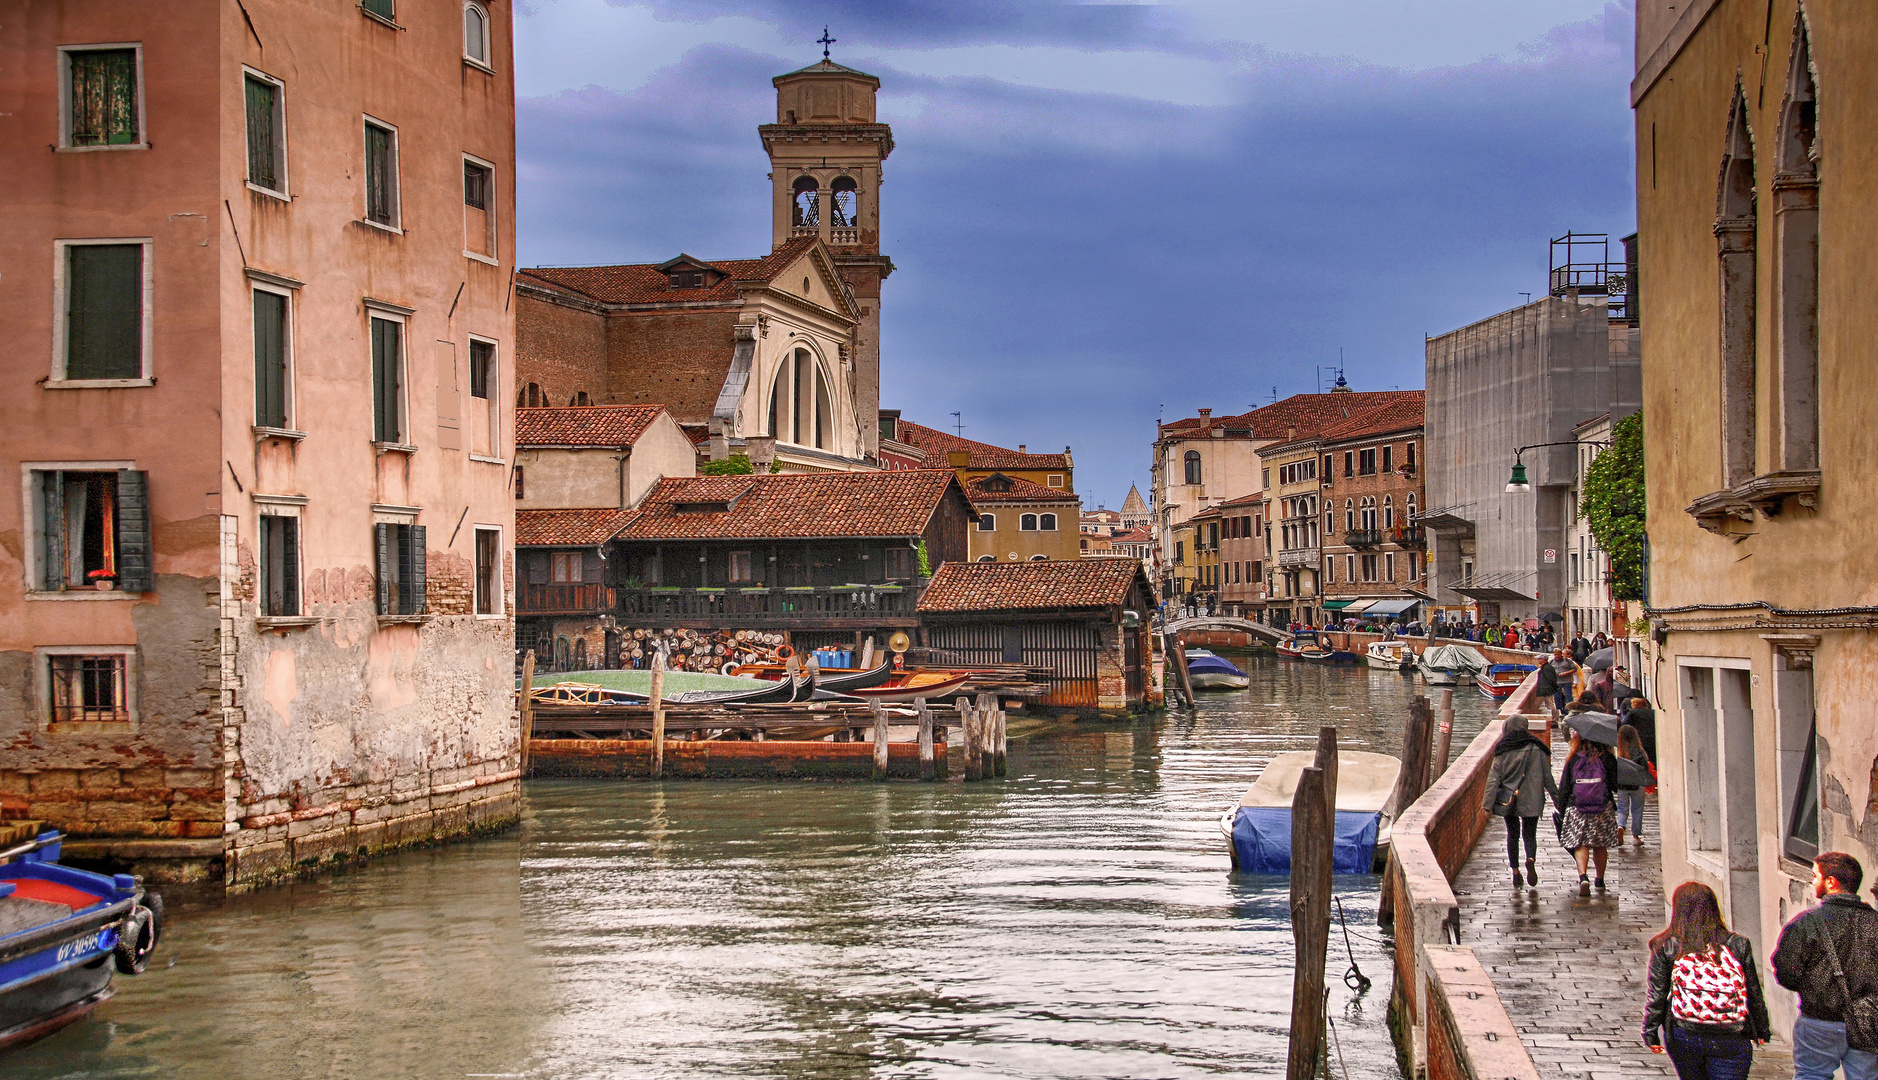 Gondelwerft Venedig (Squero San Trovaso)